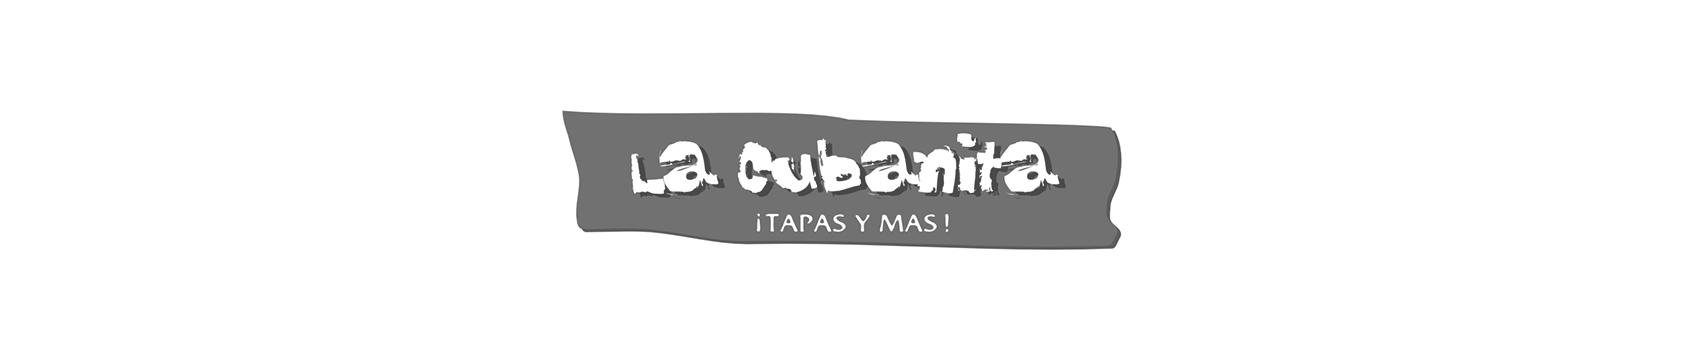 Opdrachtgevers-Cubanita